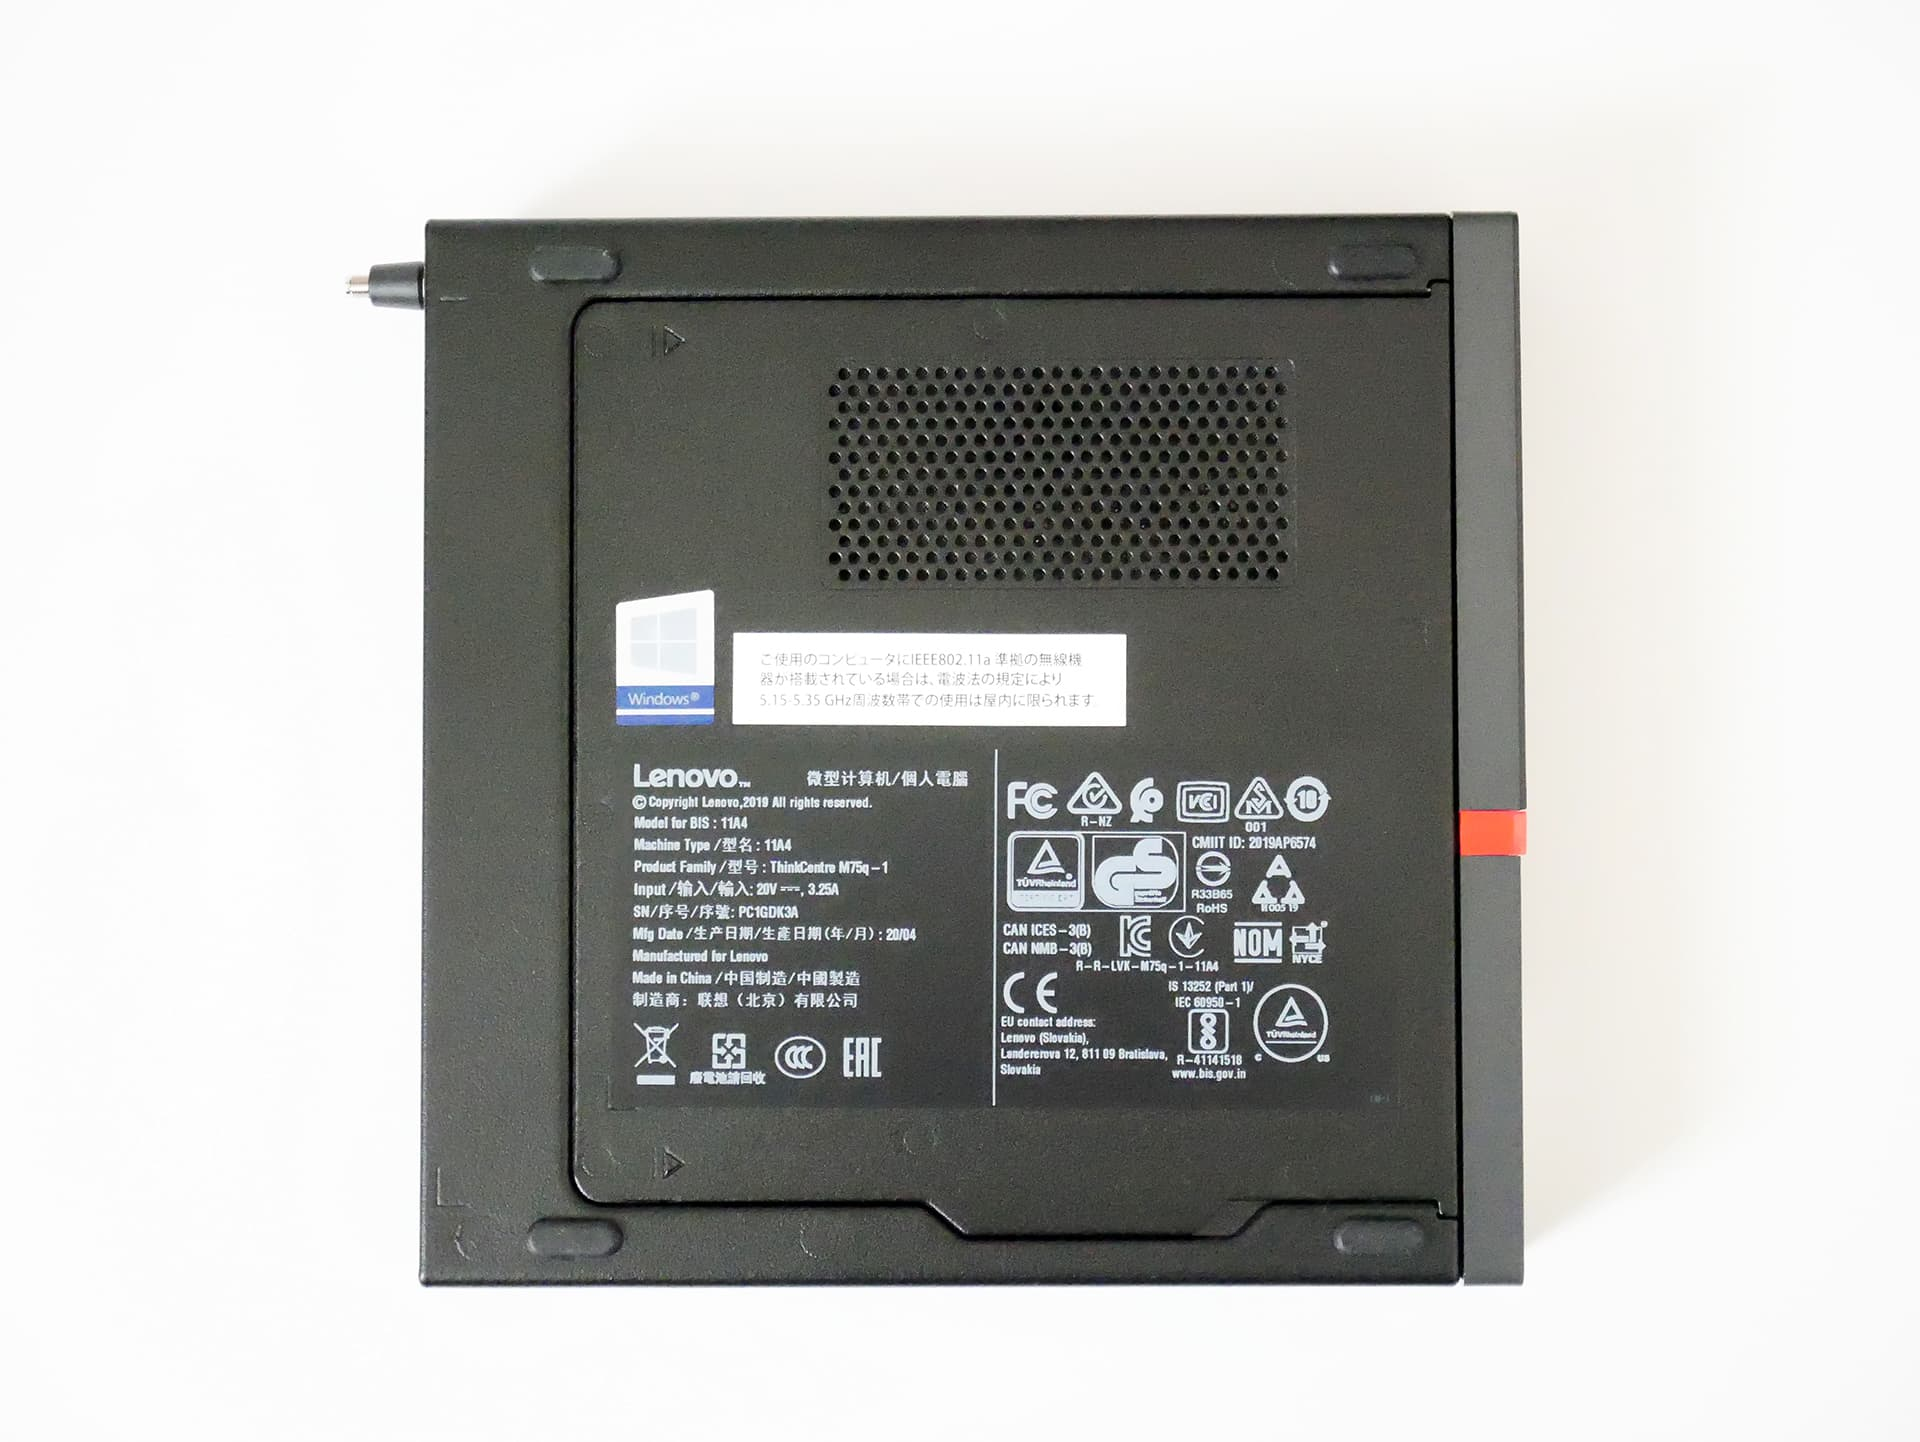 ThinkCentre M75q-1 Tiny底面